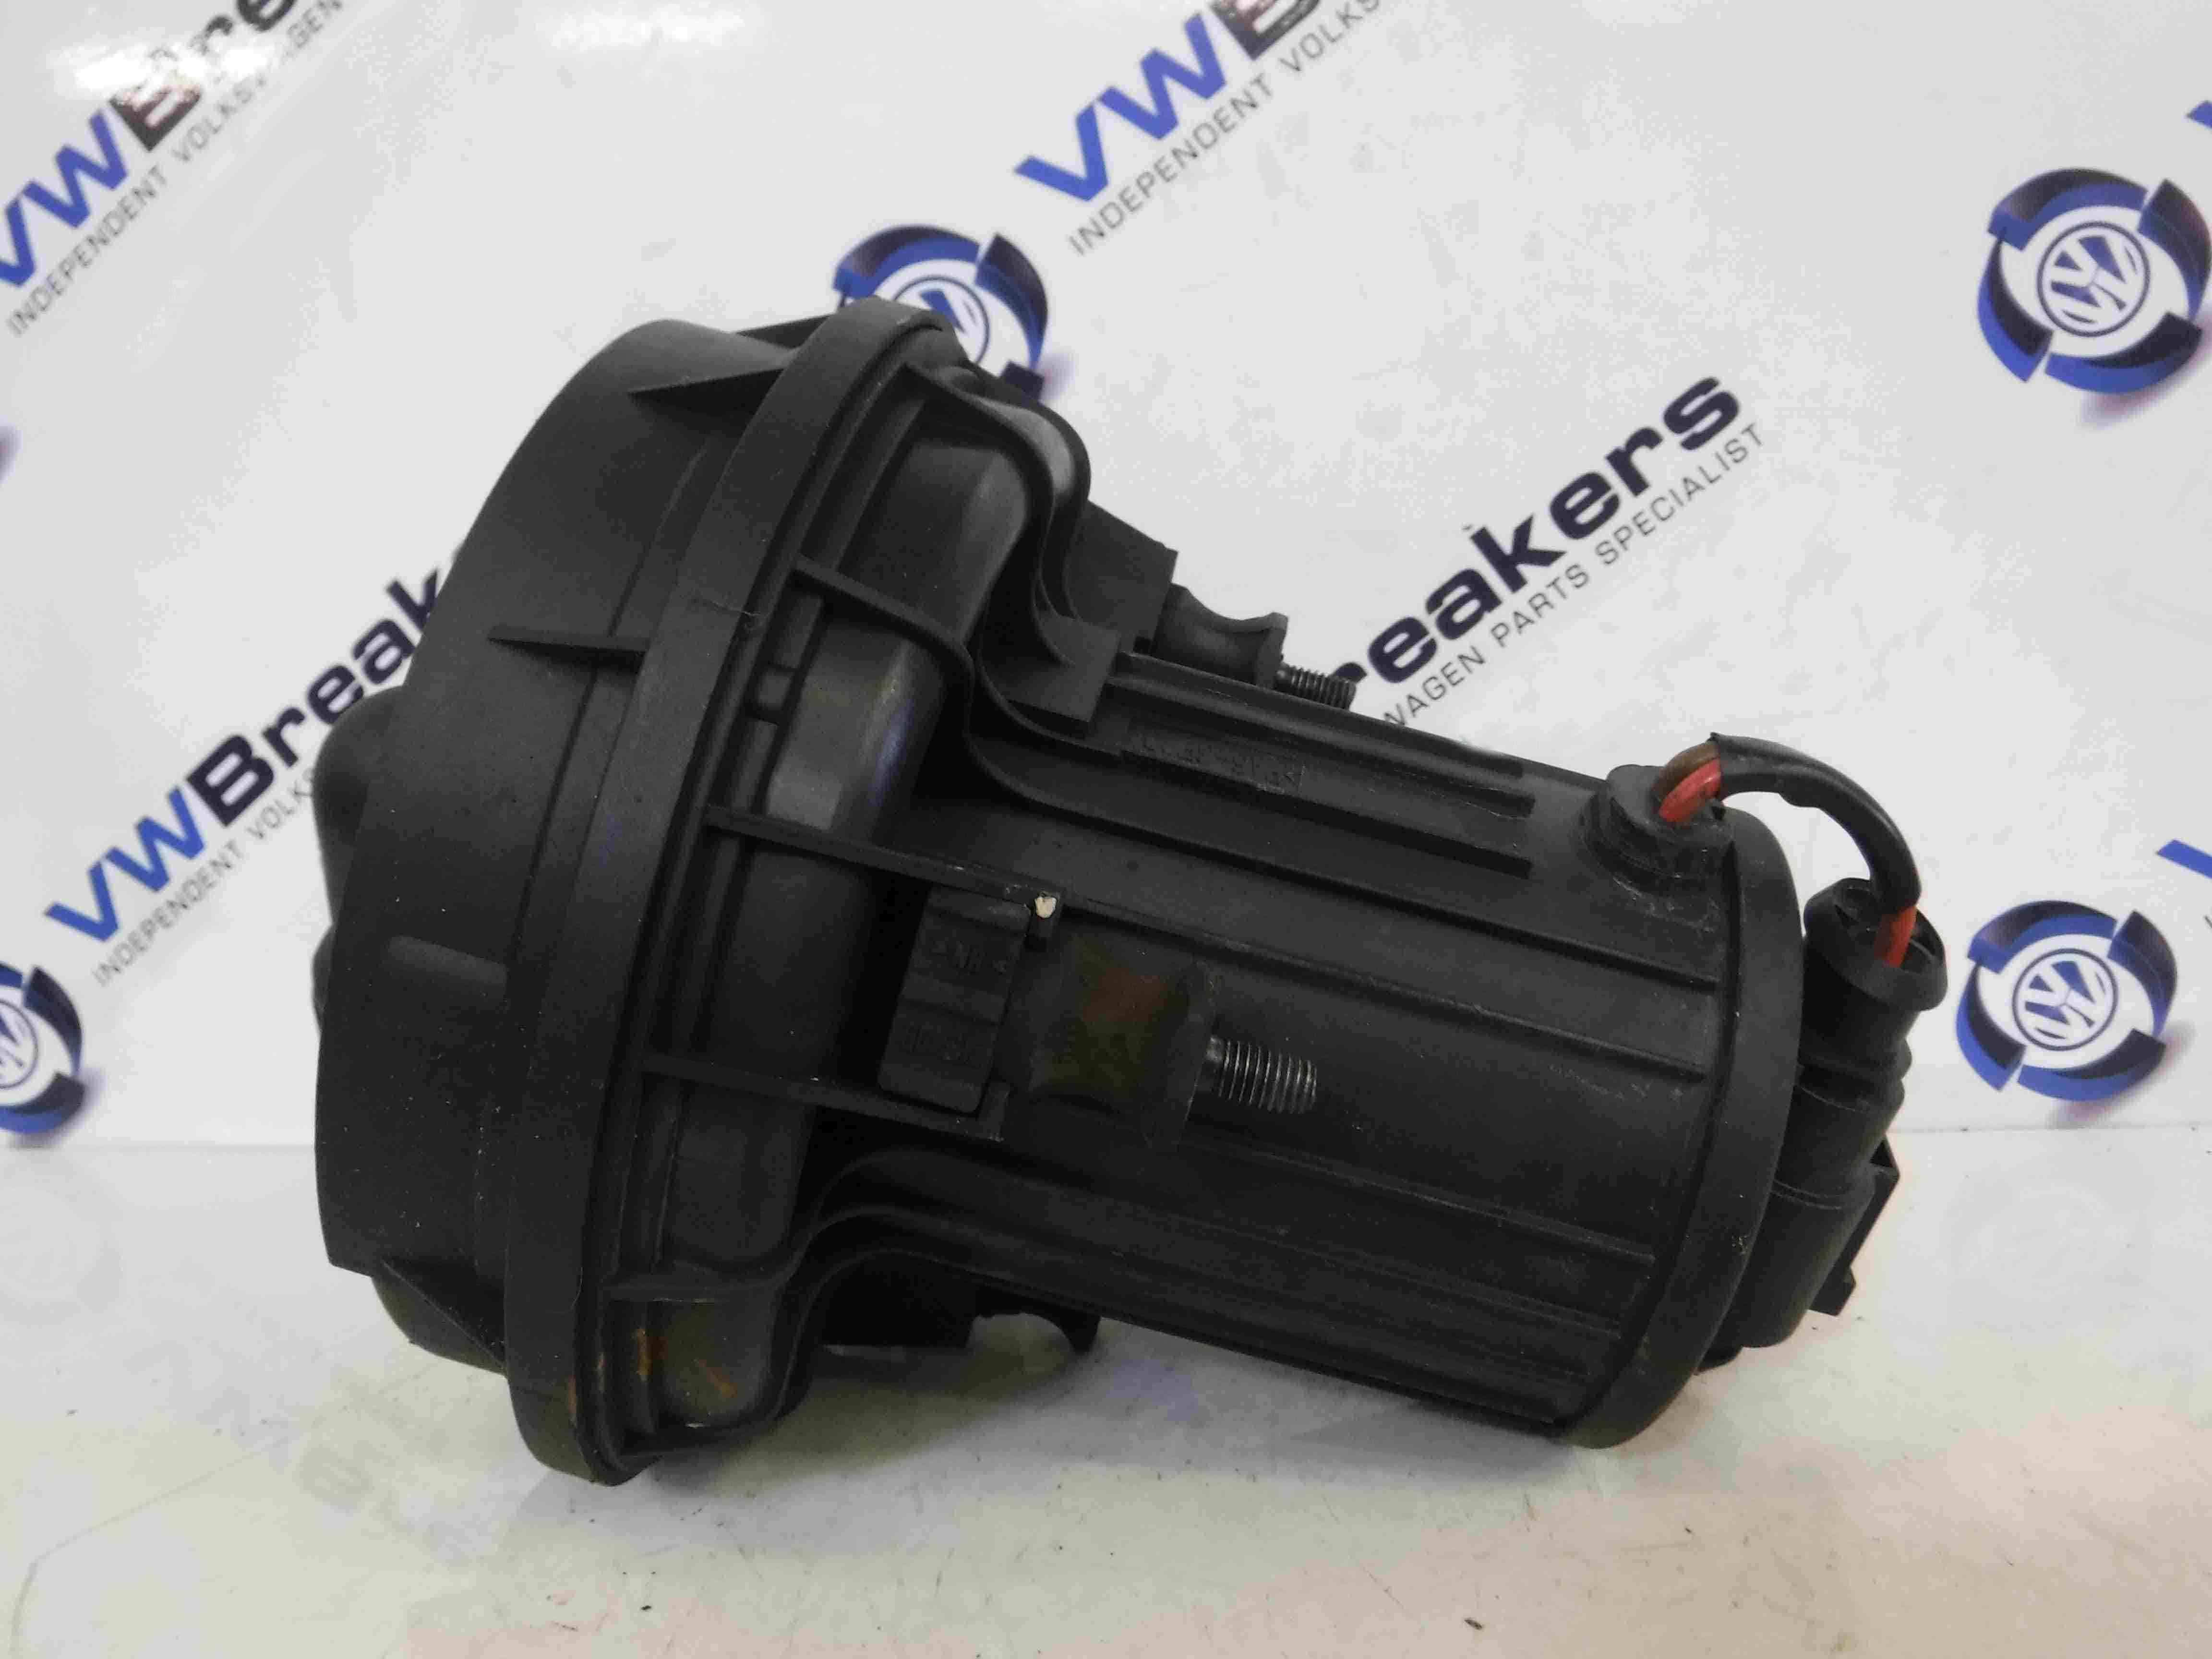 Volkswagen Beetle 1999-2006 Secondary Air Smog Pump 06A131333C 06A131333C